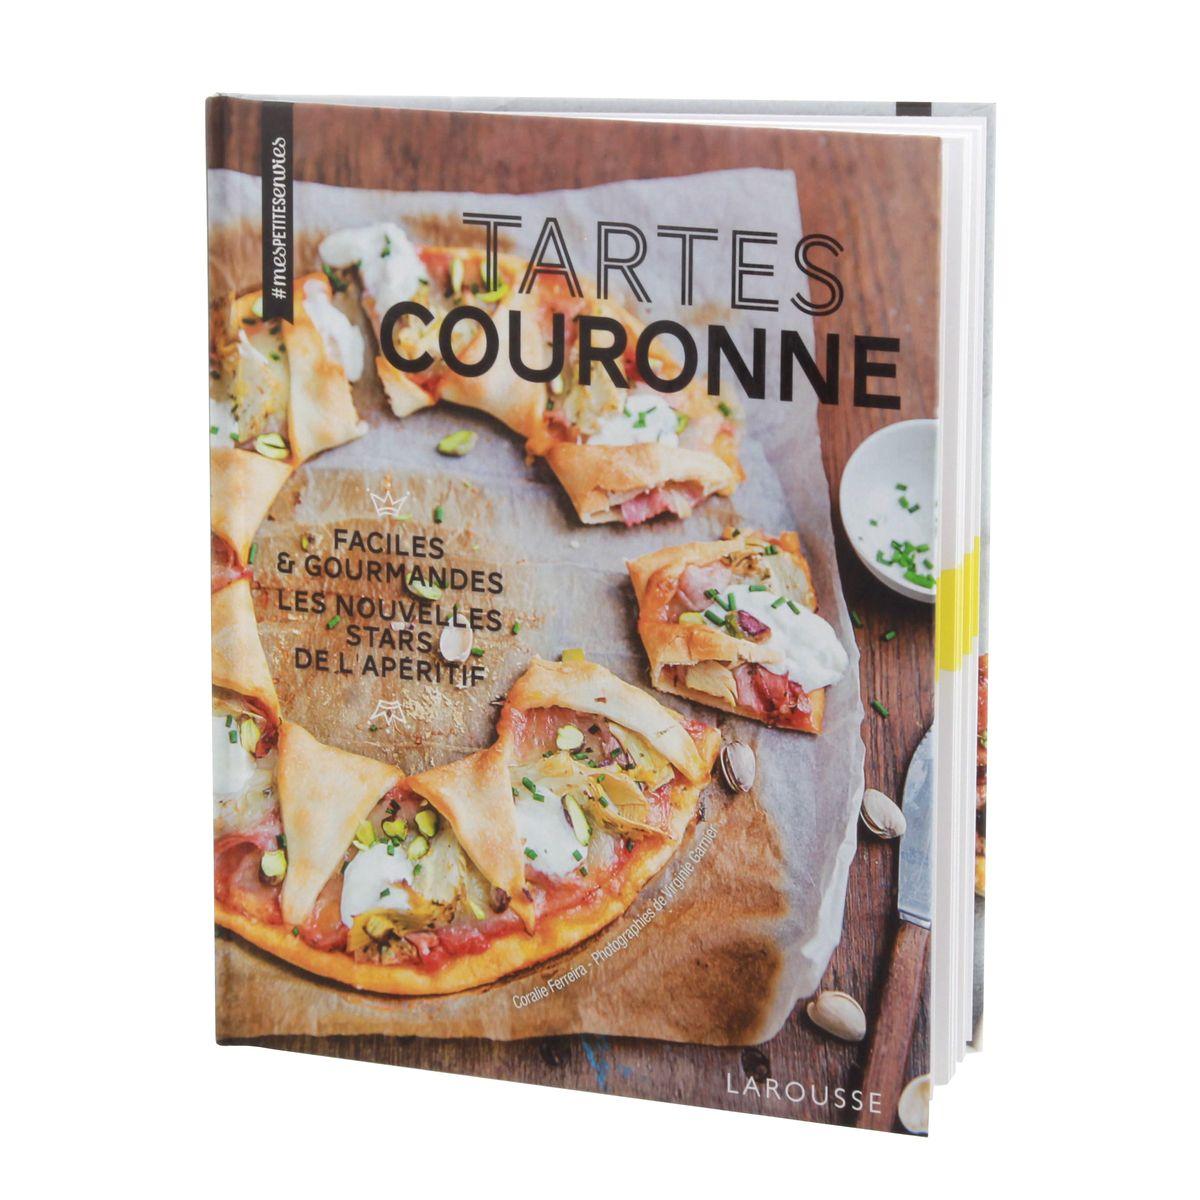 TARTES COURONNE  - LAROUSSE